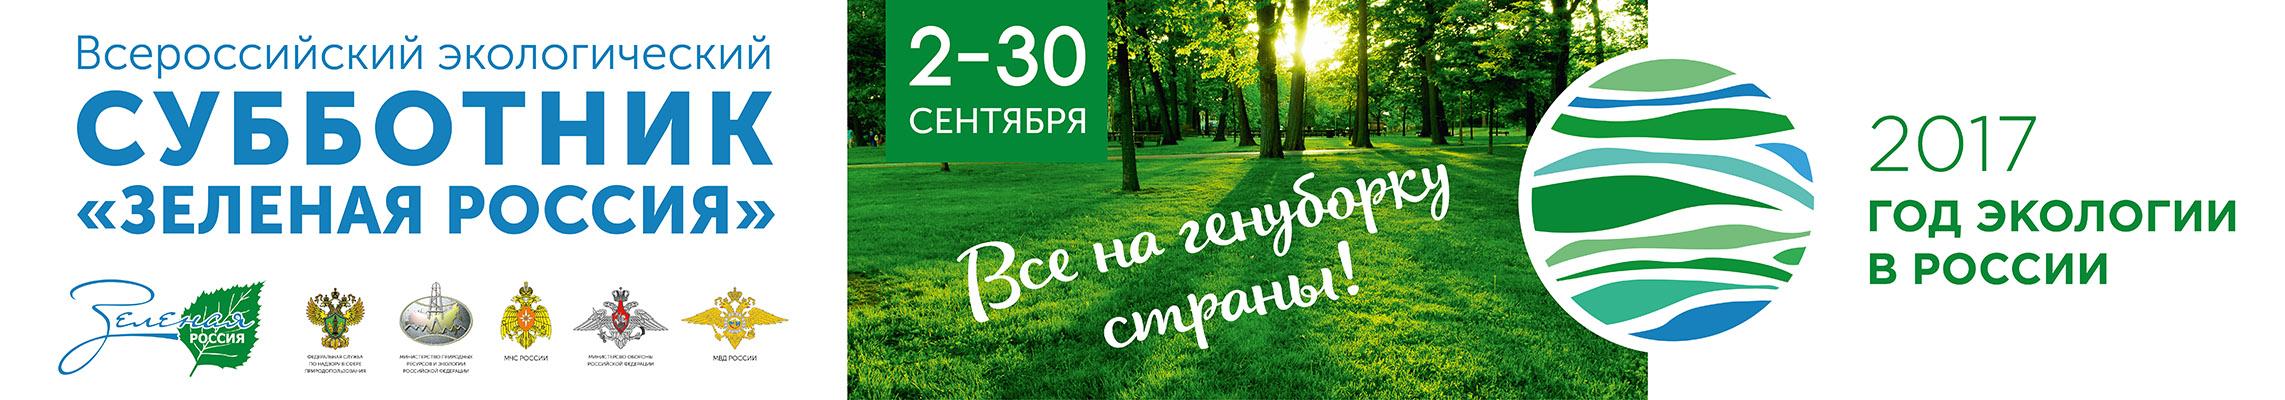 Субботник 2017_400x70_02